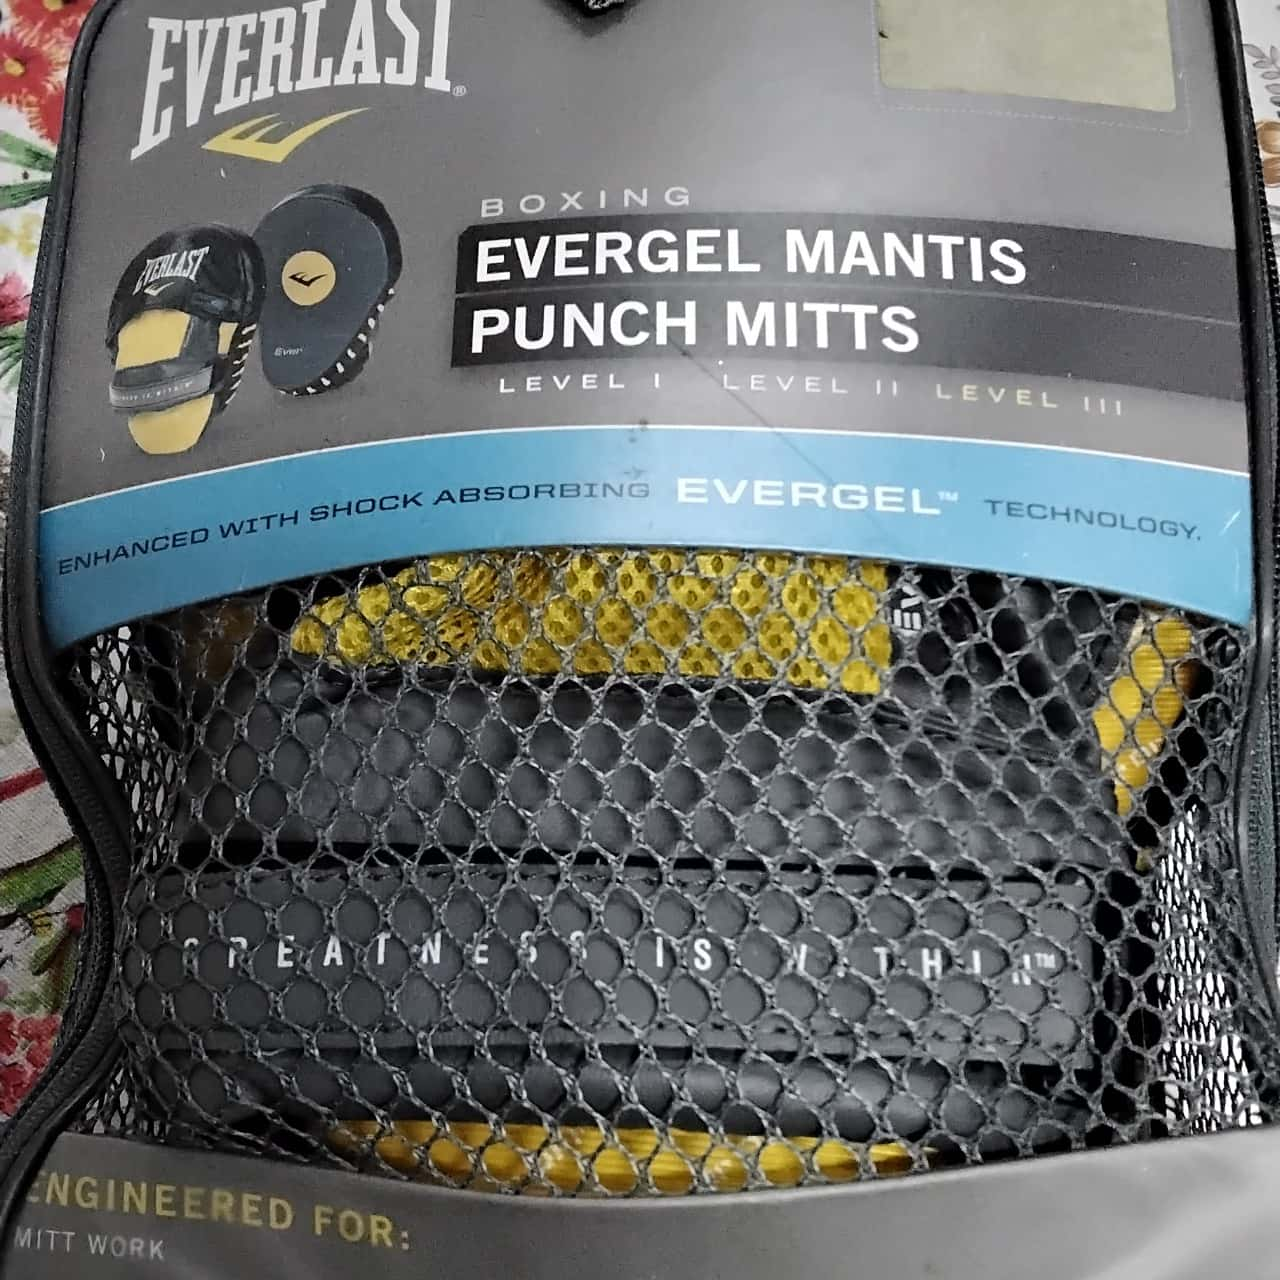 Everlast Evangel Mantis Punch Mitts